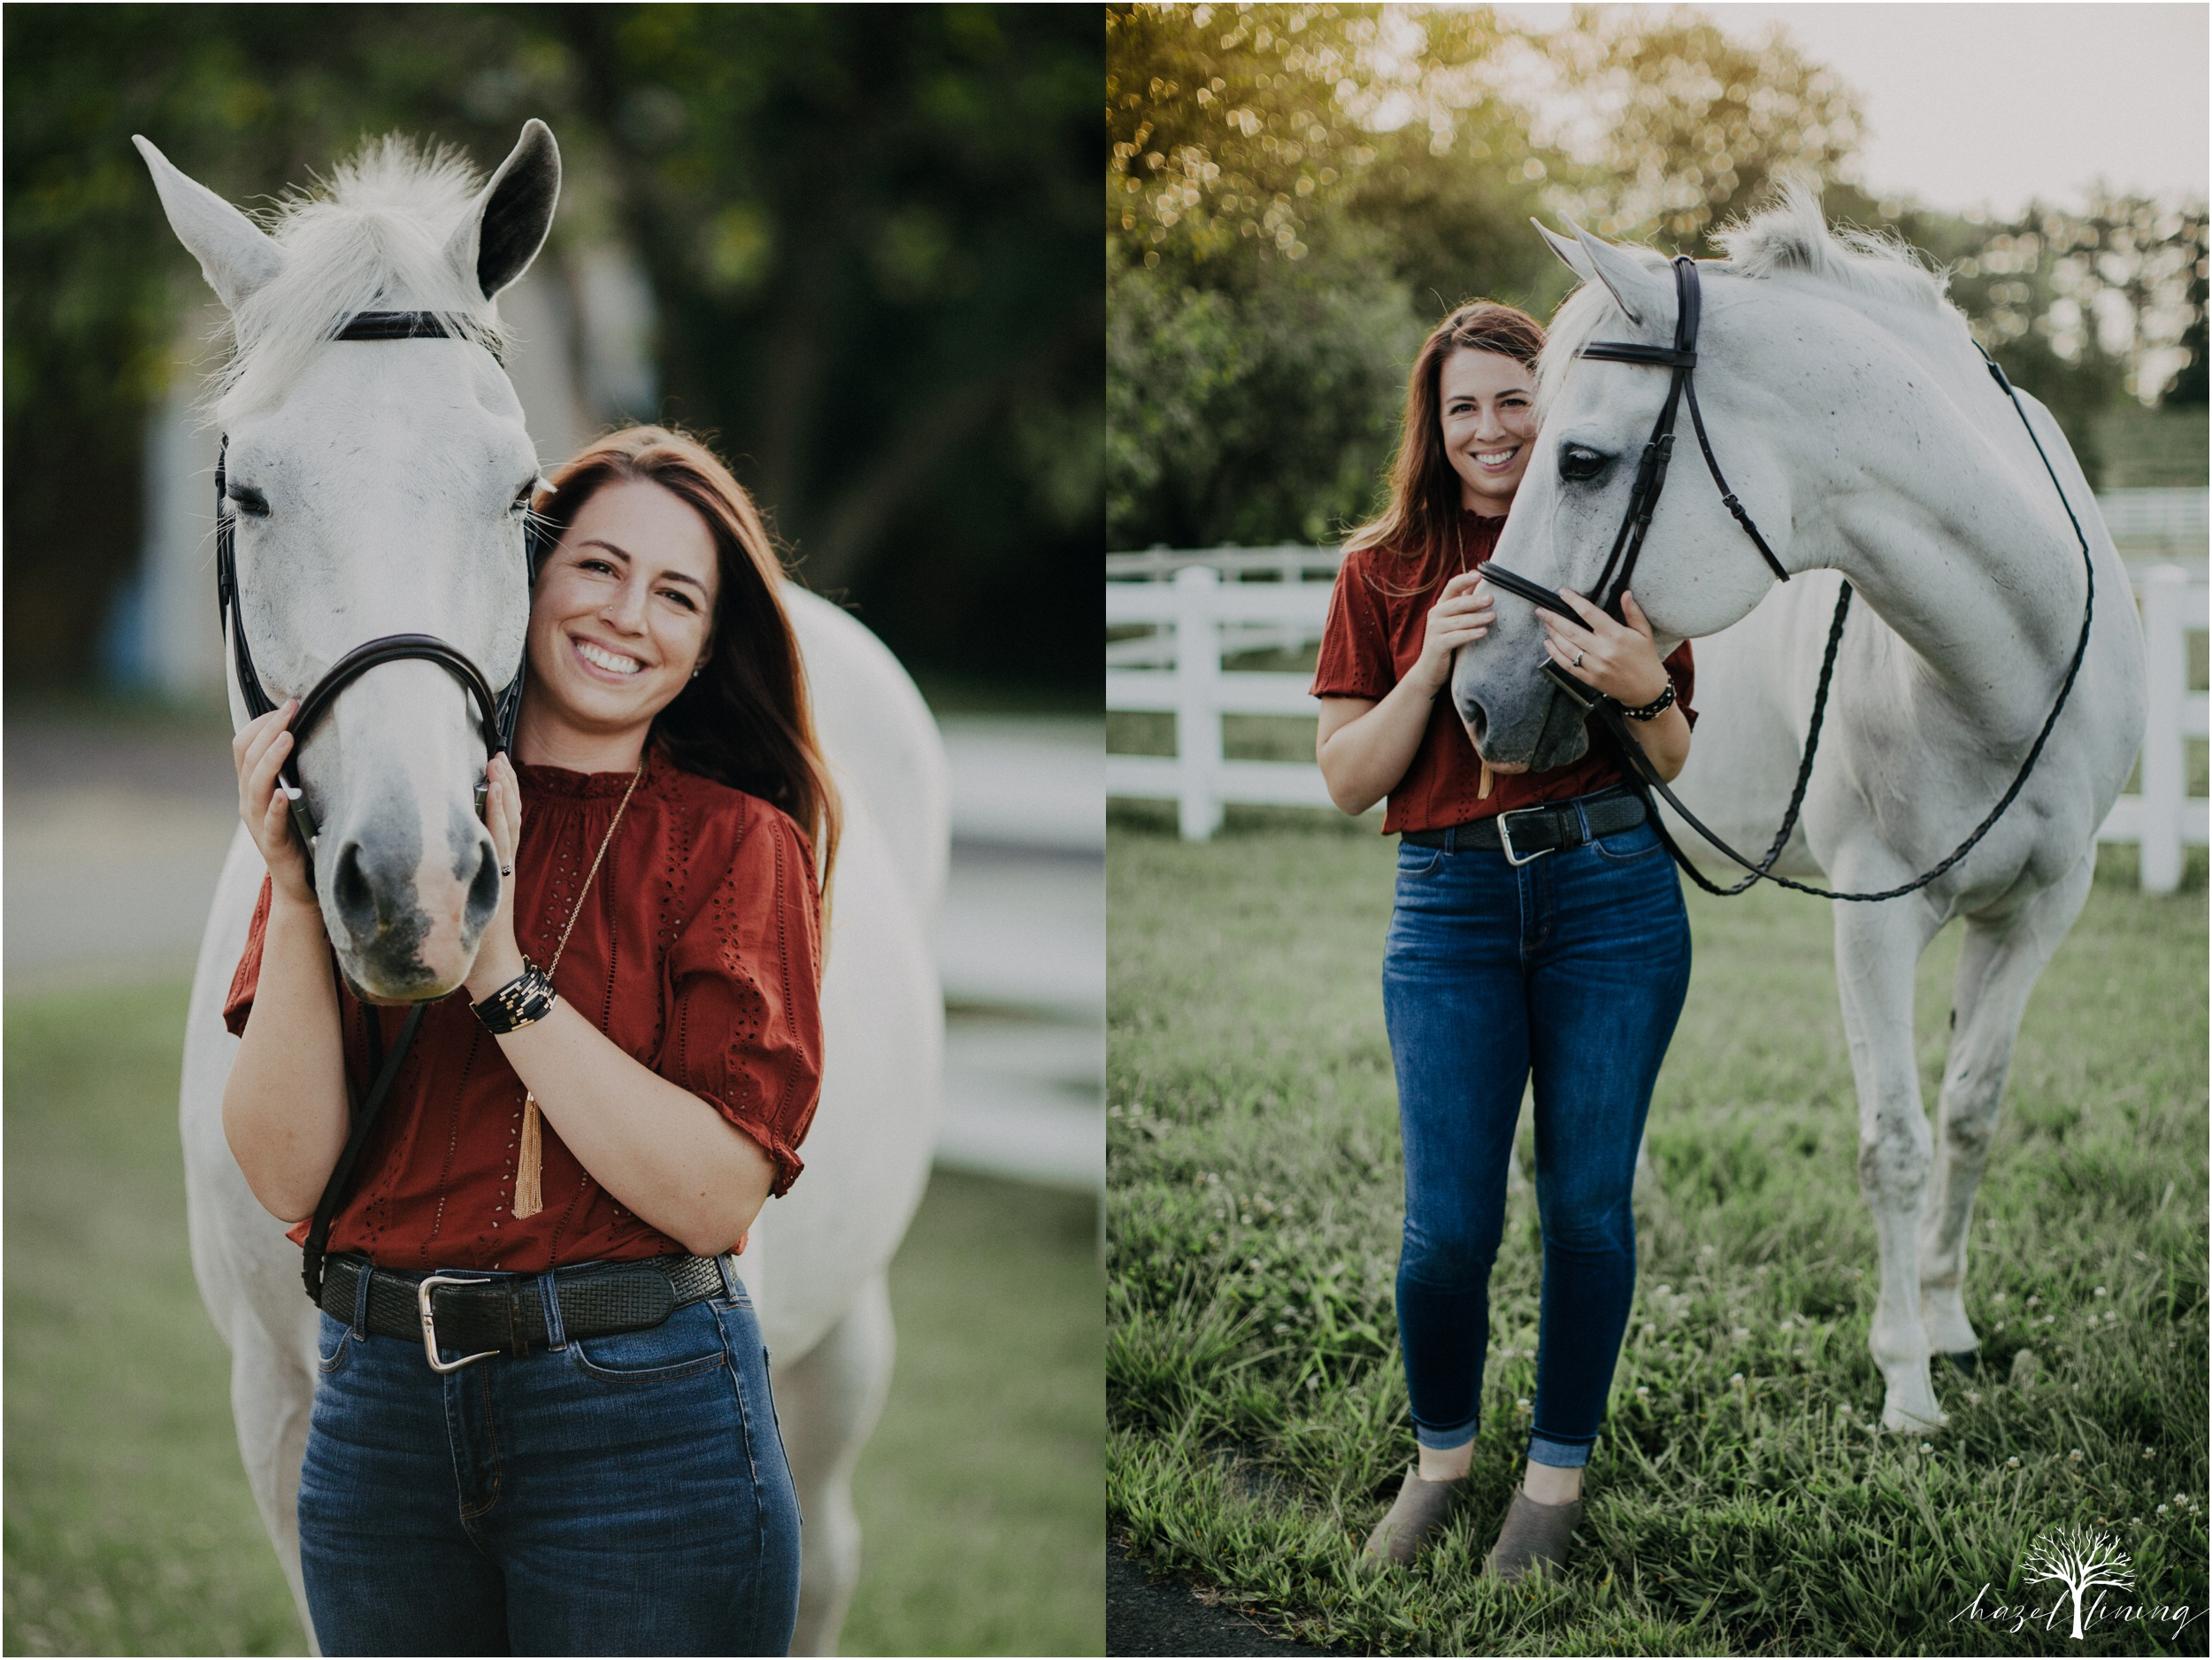 taylor-adams-and-horse-delaware-valley-university-delval-summer-equestrian-portrait-session-hazel-lining-photography-destination-elopement-wedding-engagement-photography_0009.jpg